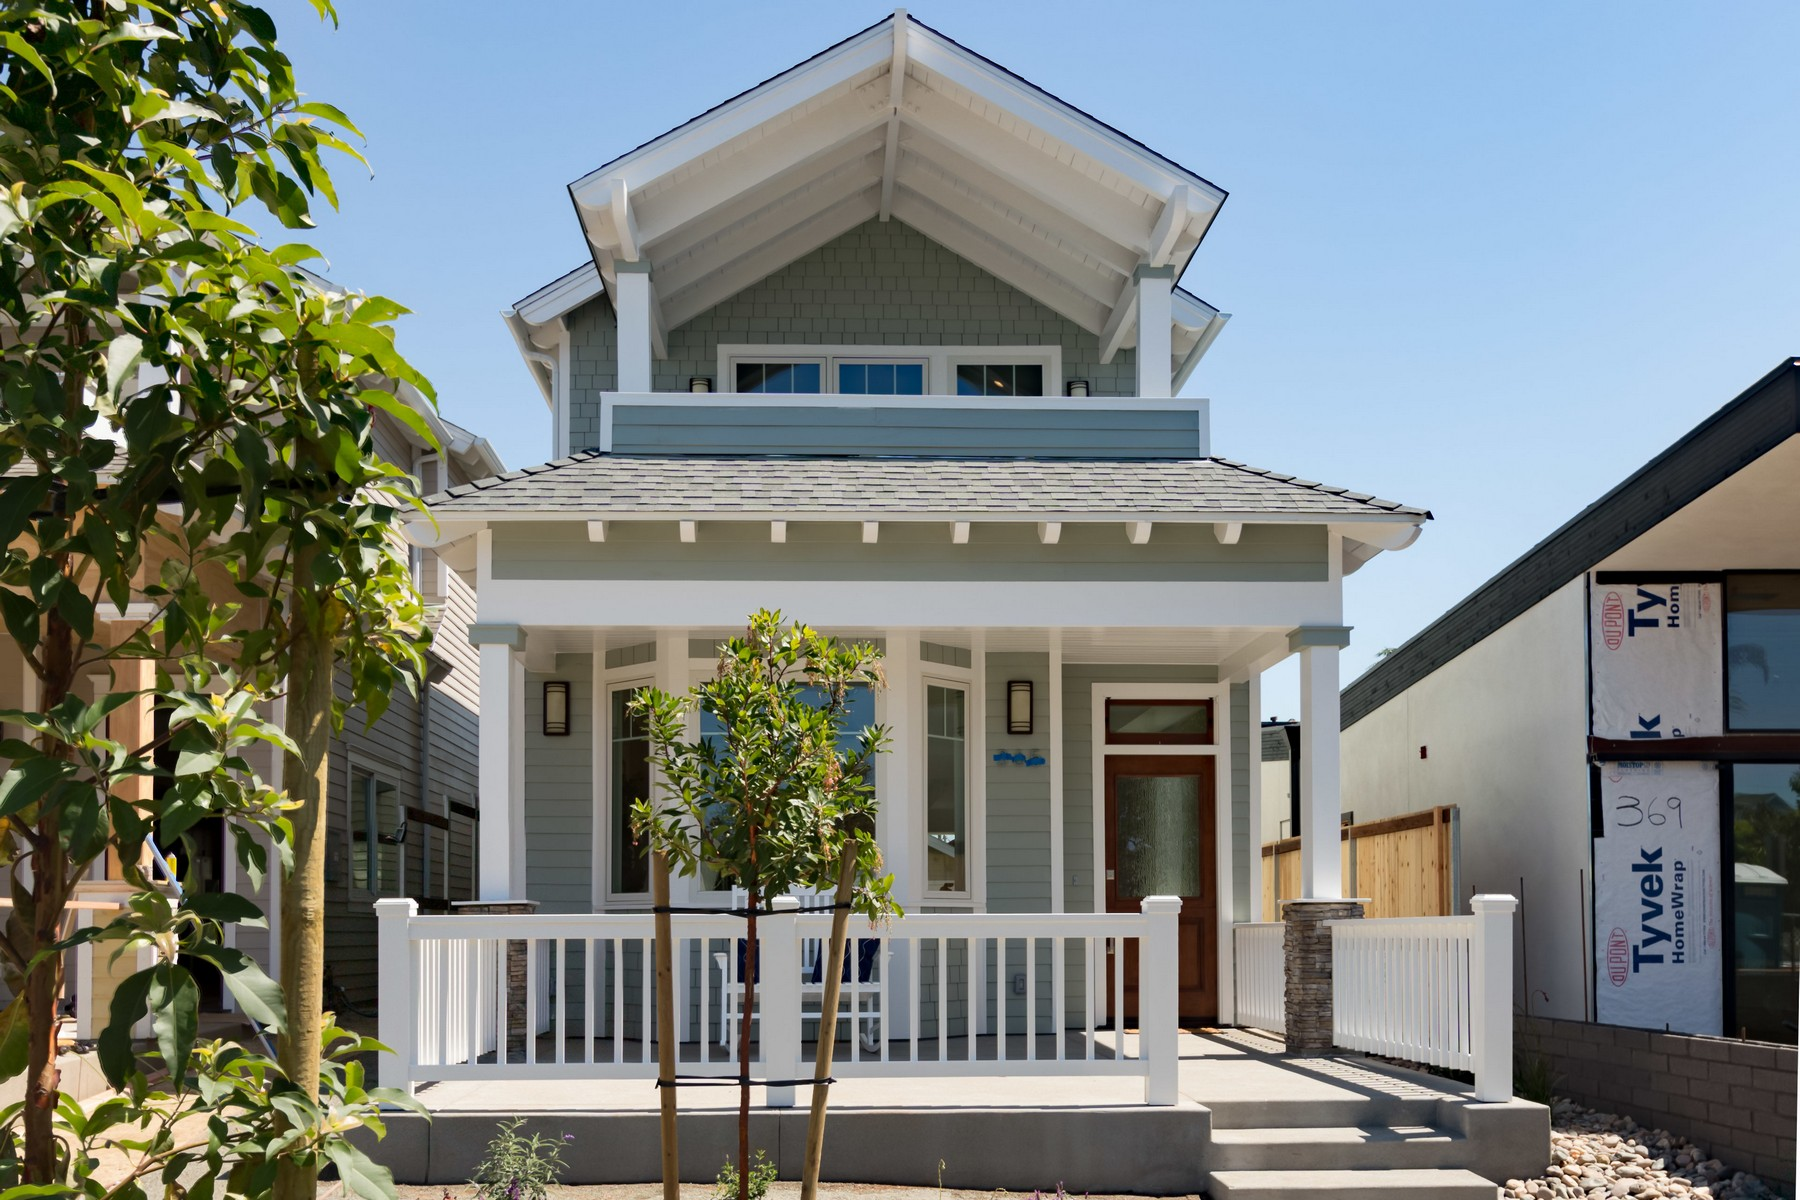 Single Family Home for Sale at 365 H Ave. Coronado, California 92118 United States